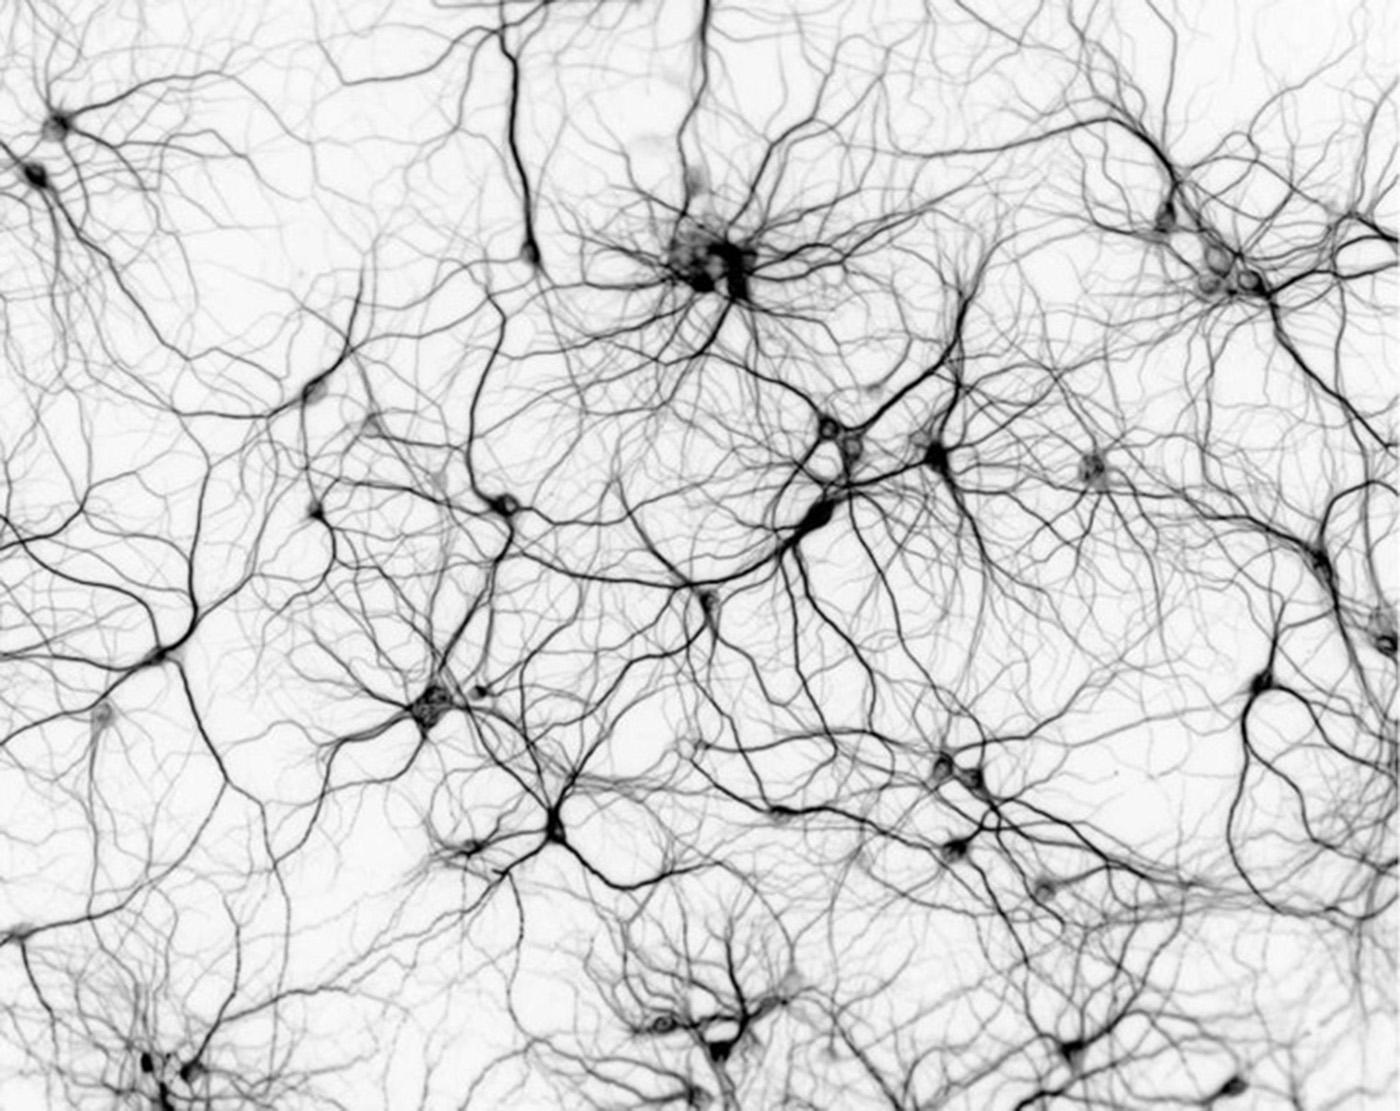 Distonia dopa-sensible autosómica recesiva